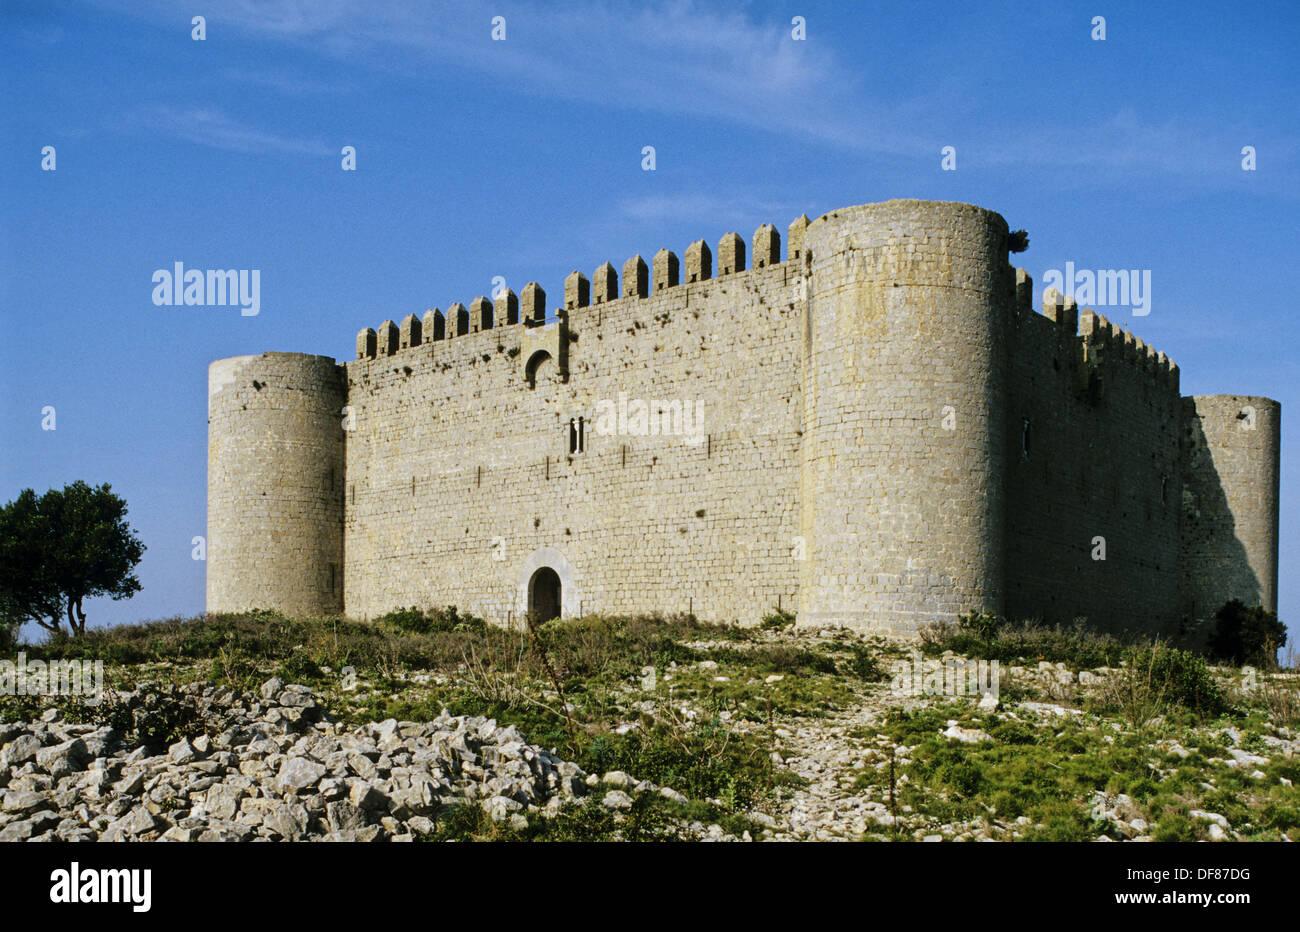 Castle (1294-1302), Torroella de Montgrí. Baix Empordà, Girona province, Catalonia, Spain - Stock Image